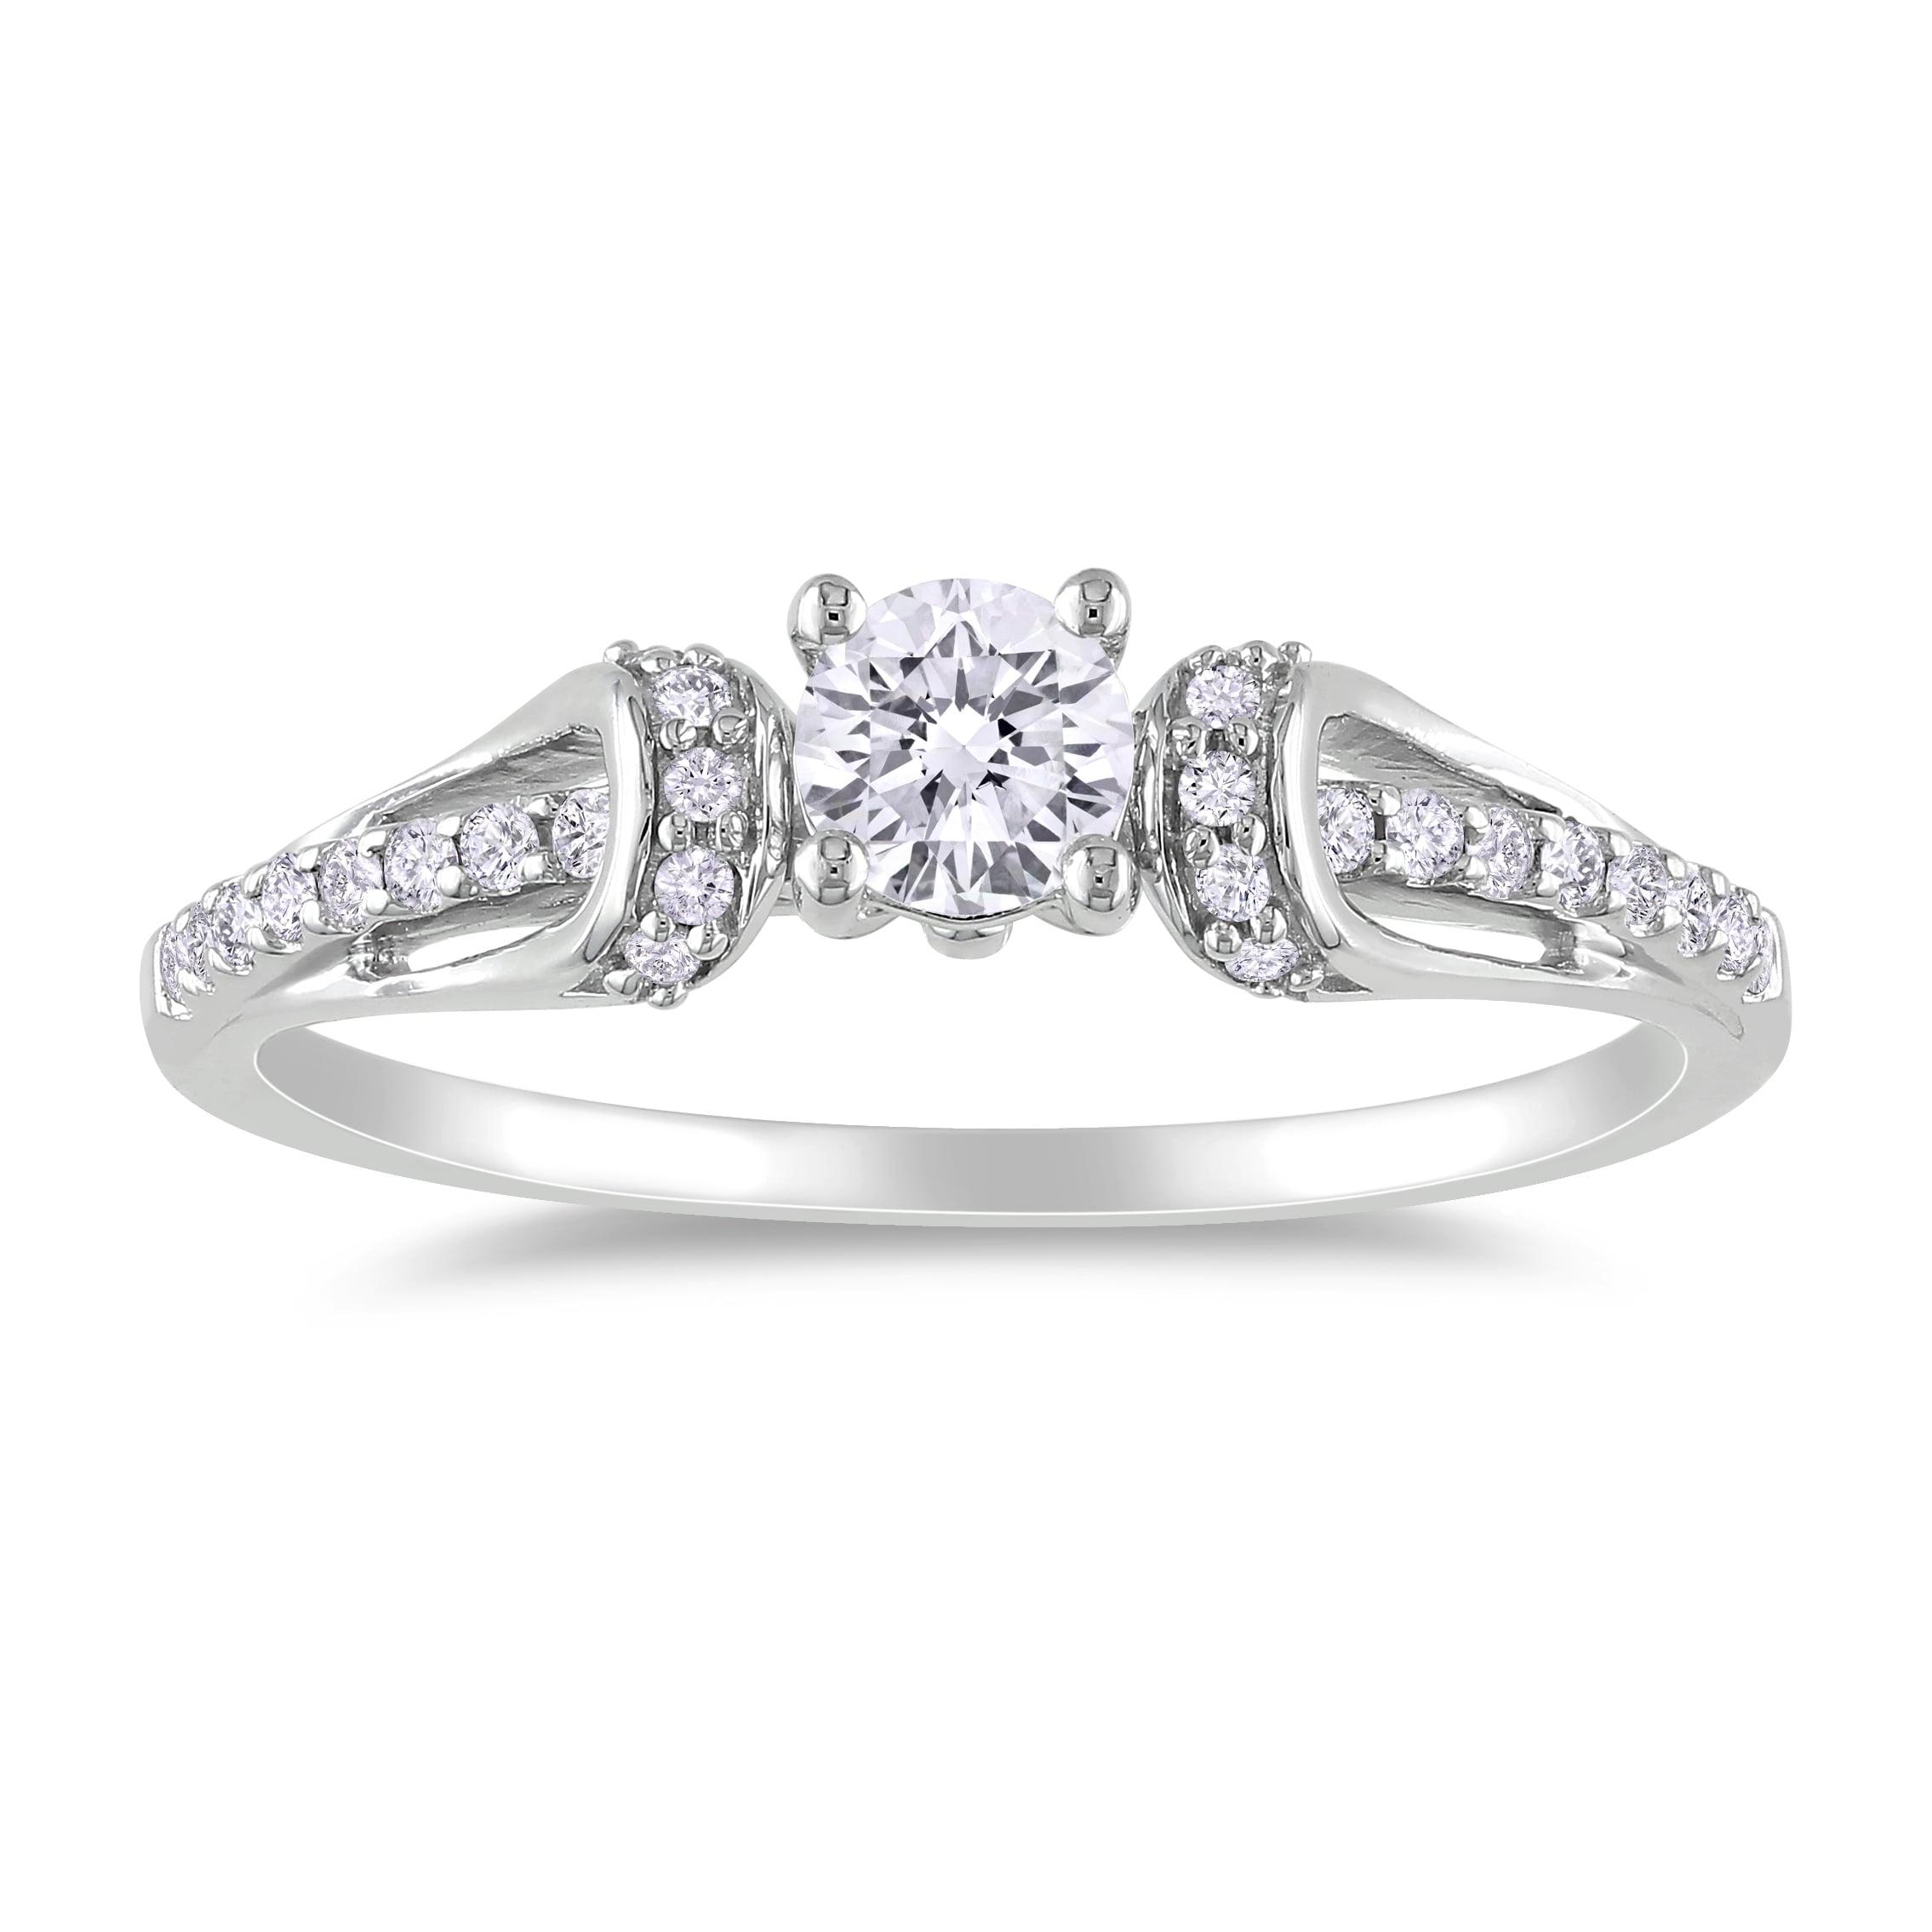 Miadora 18k White Gold 2/5ct TDW Diamond Engagement Ring